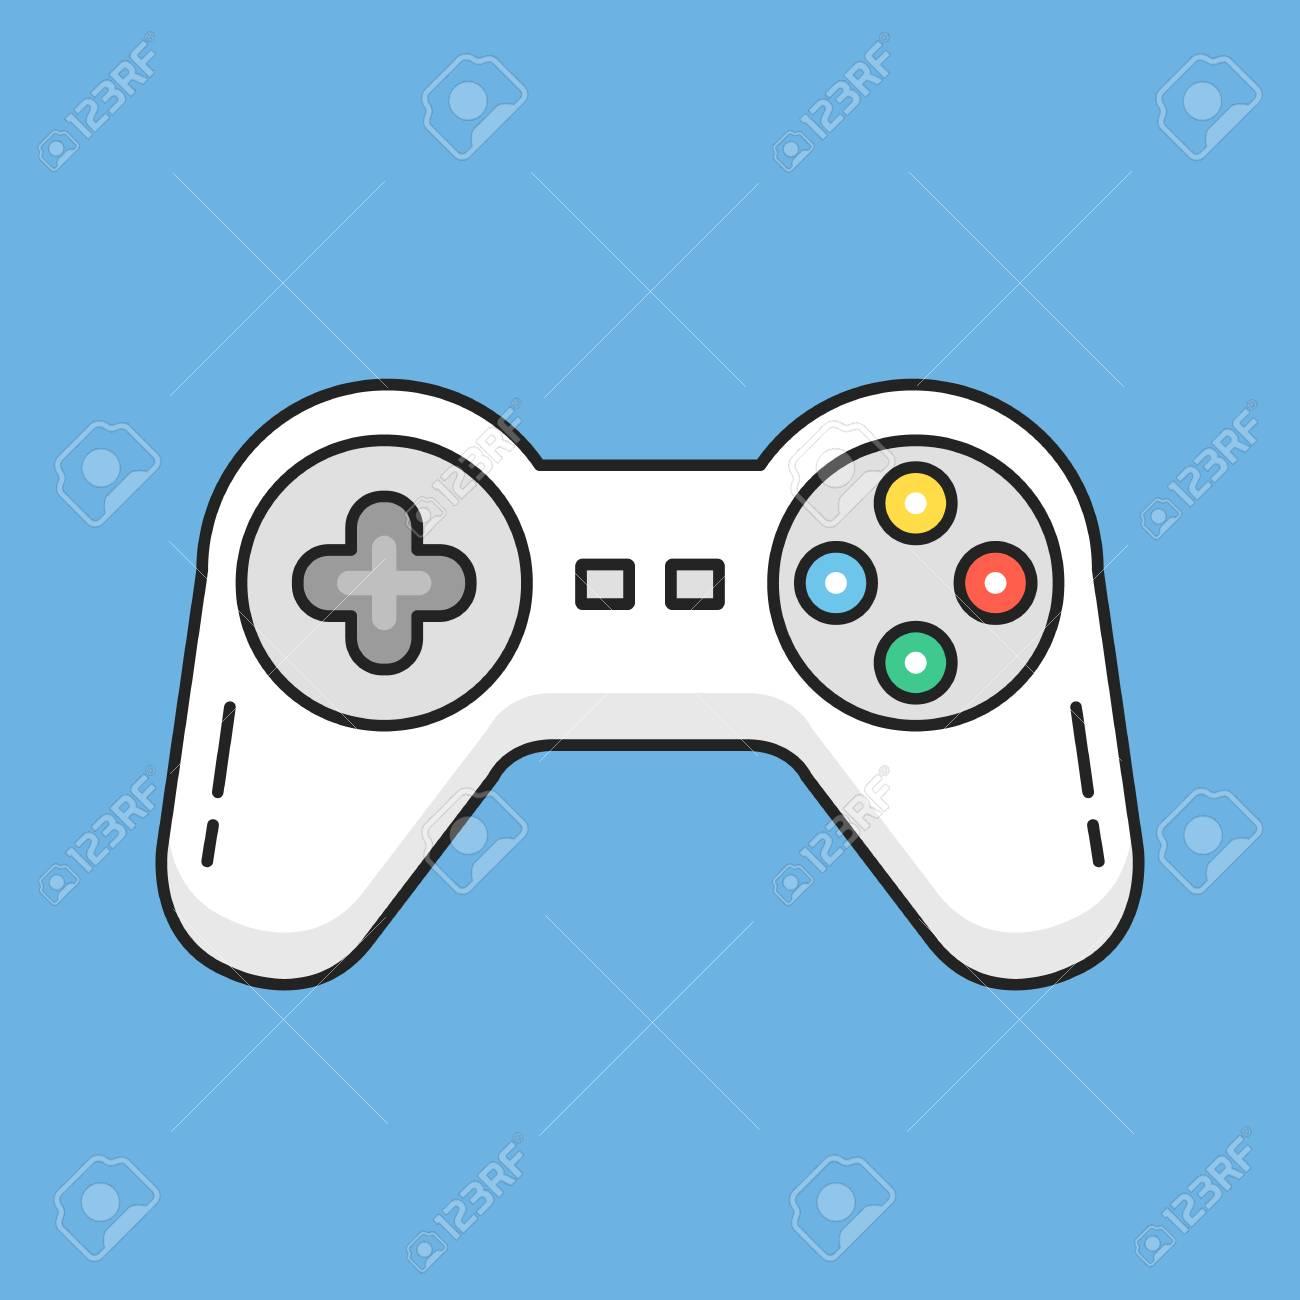 Dnne Linie Gamepad Symbol Weie Game Controller Symbol Modernes